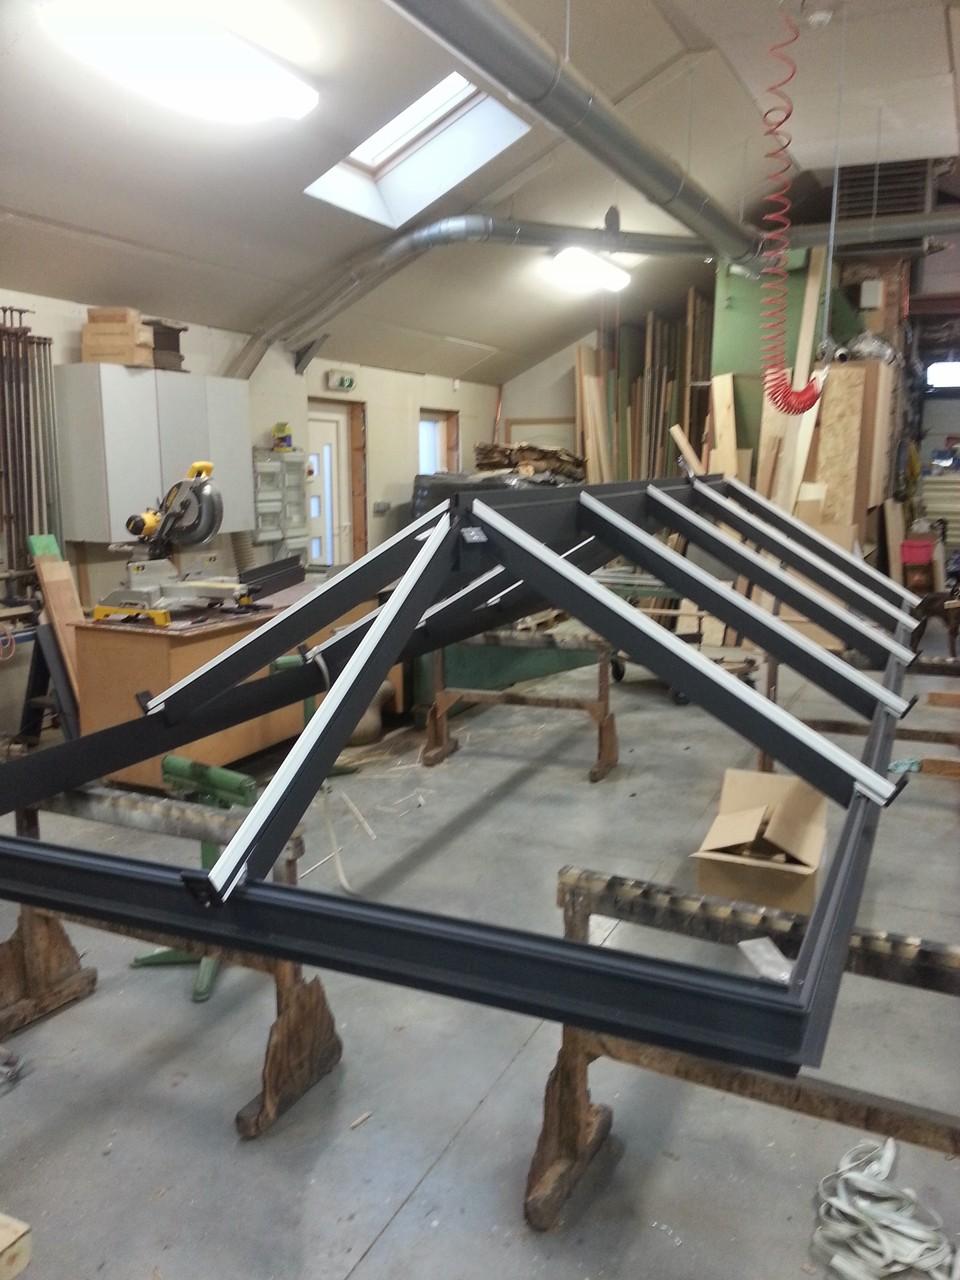 Fabricant blyweert aluminium conception menuiserie for Fabricant menuiserie aluminium